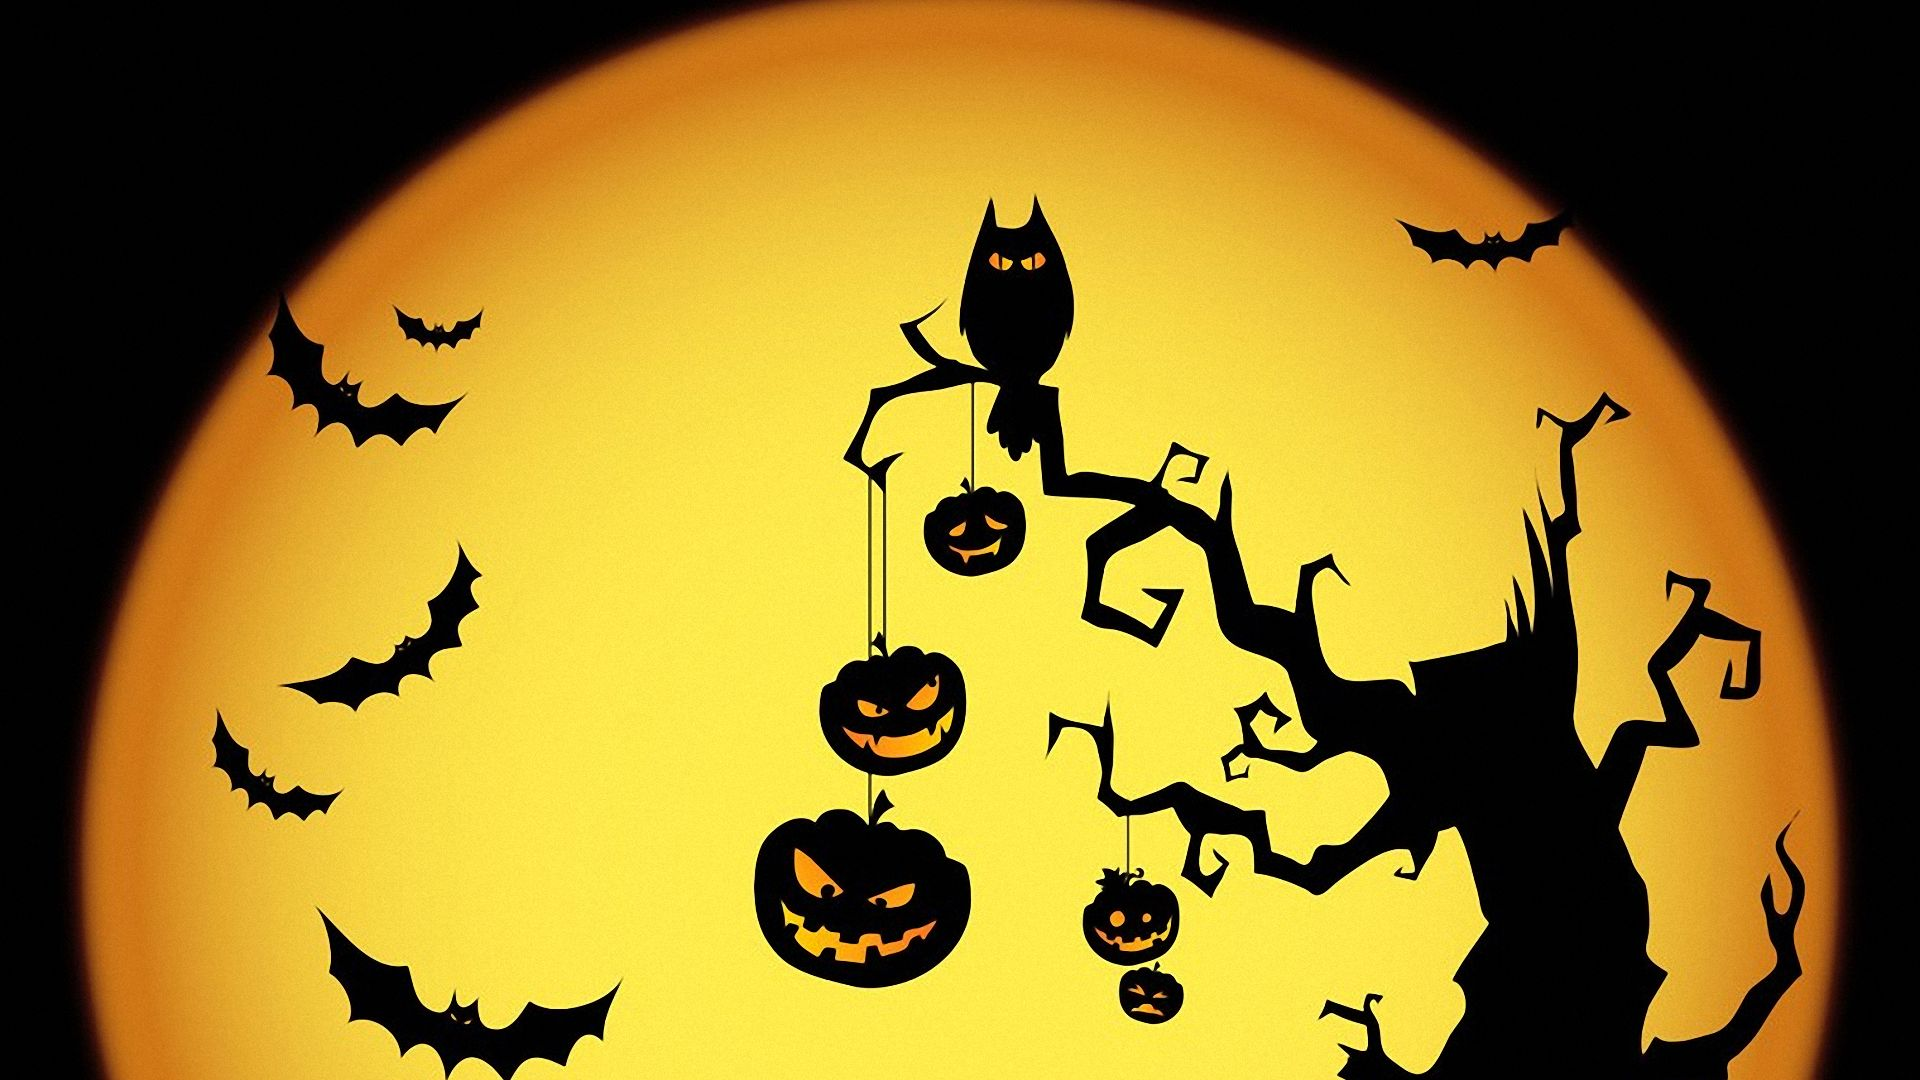 Magical Witch Treat Wallpaper Halloween Magical Treat Desktop